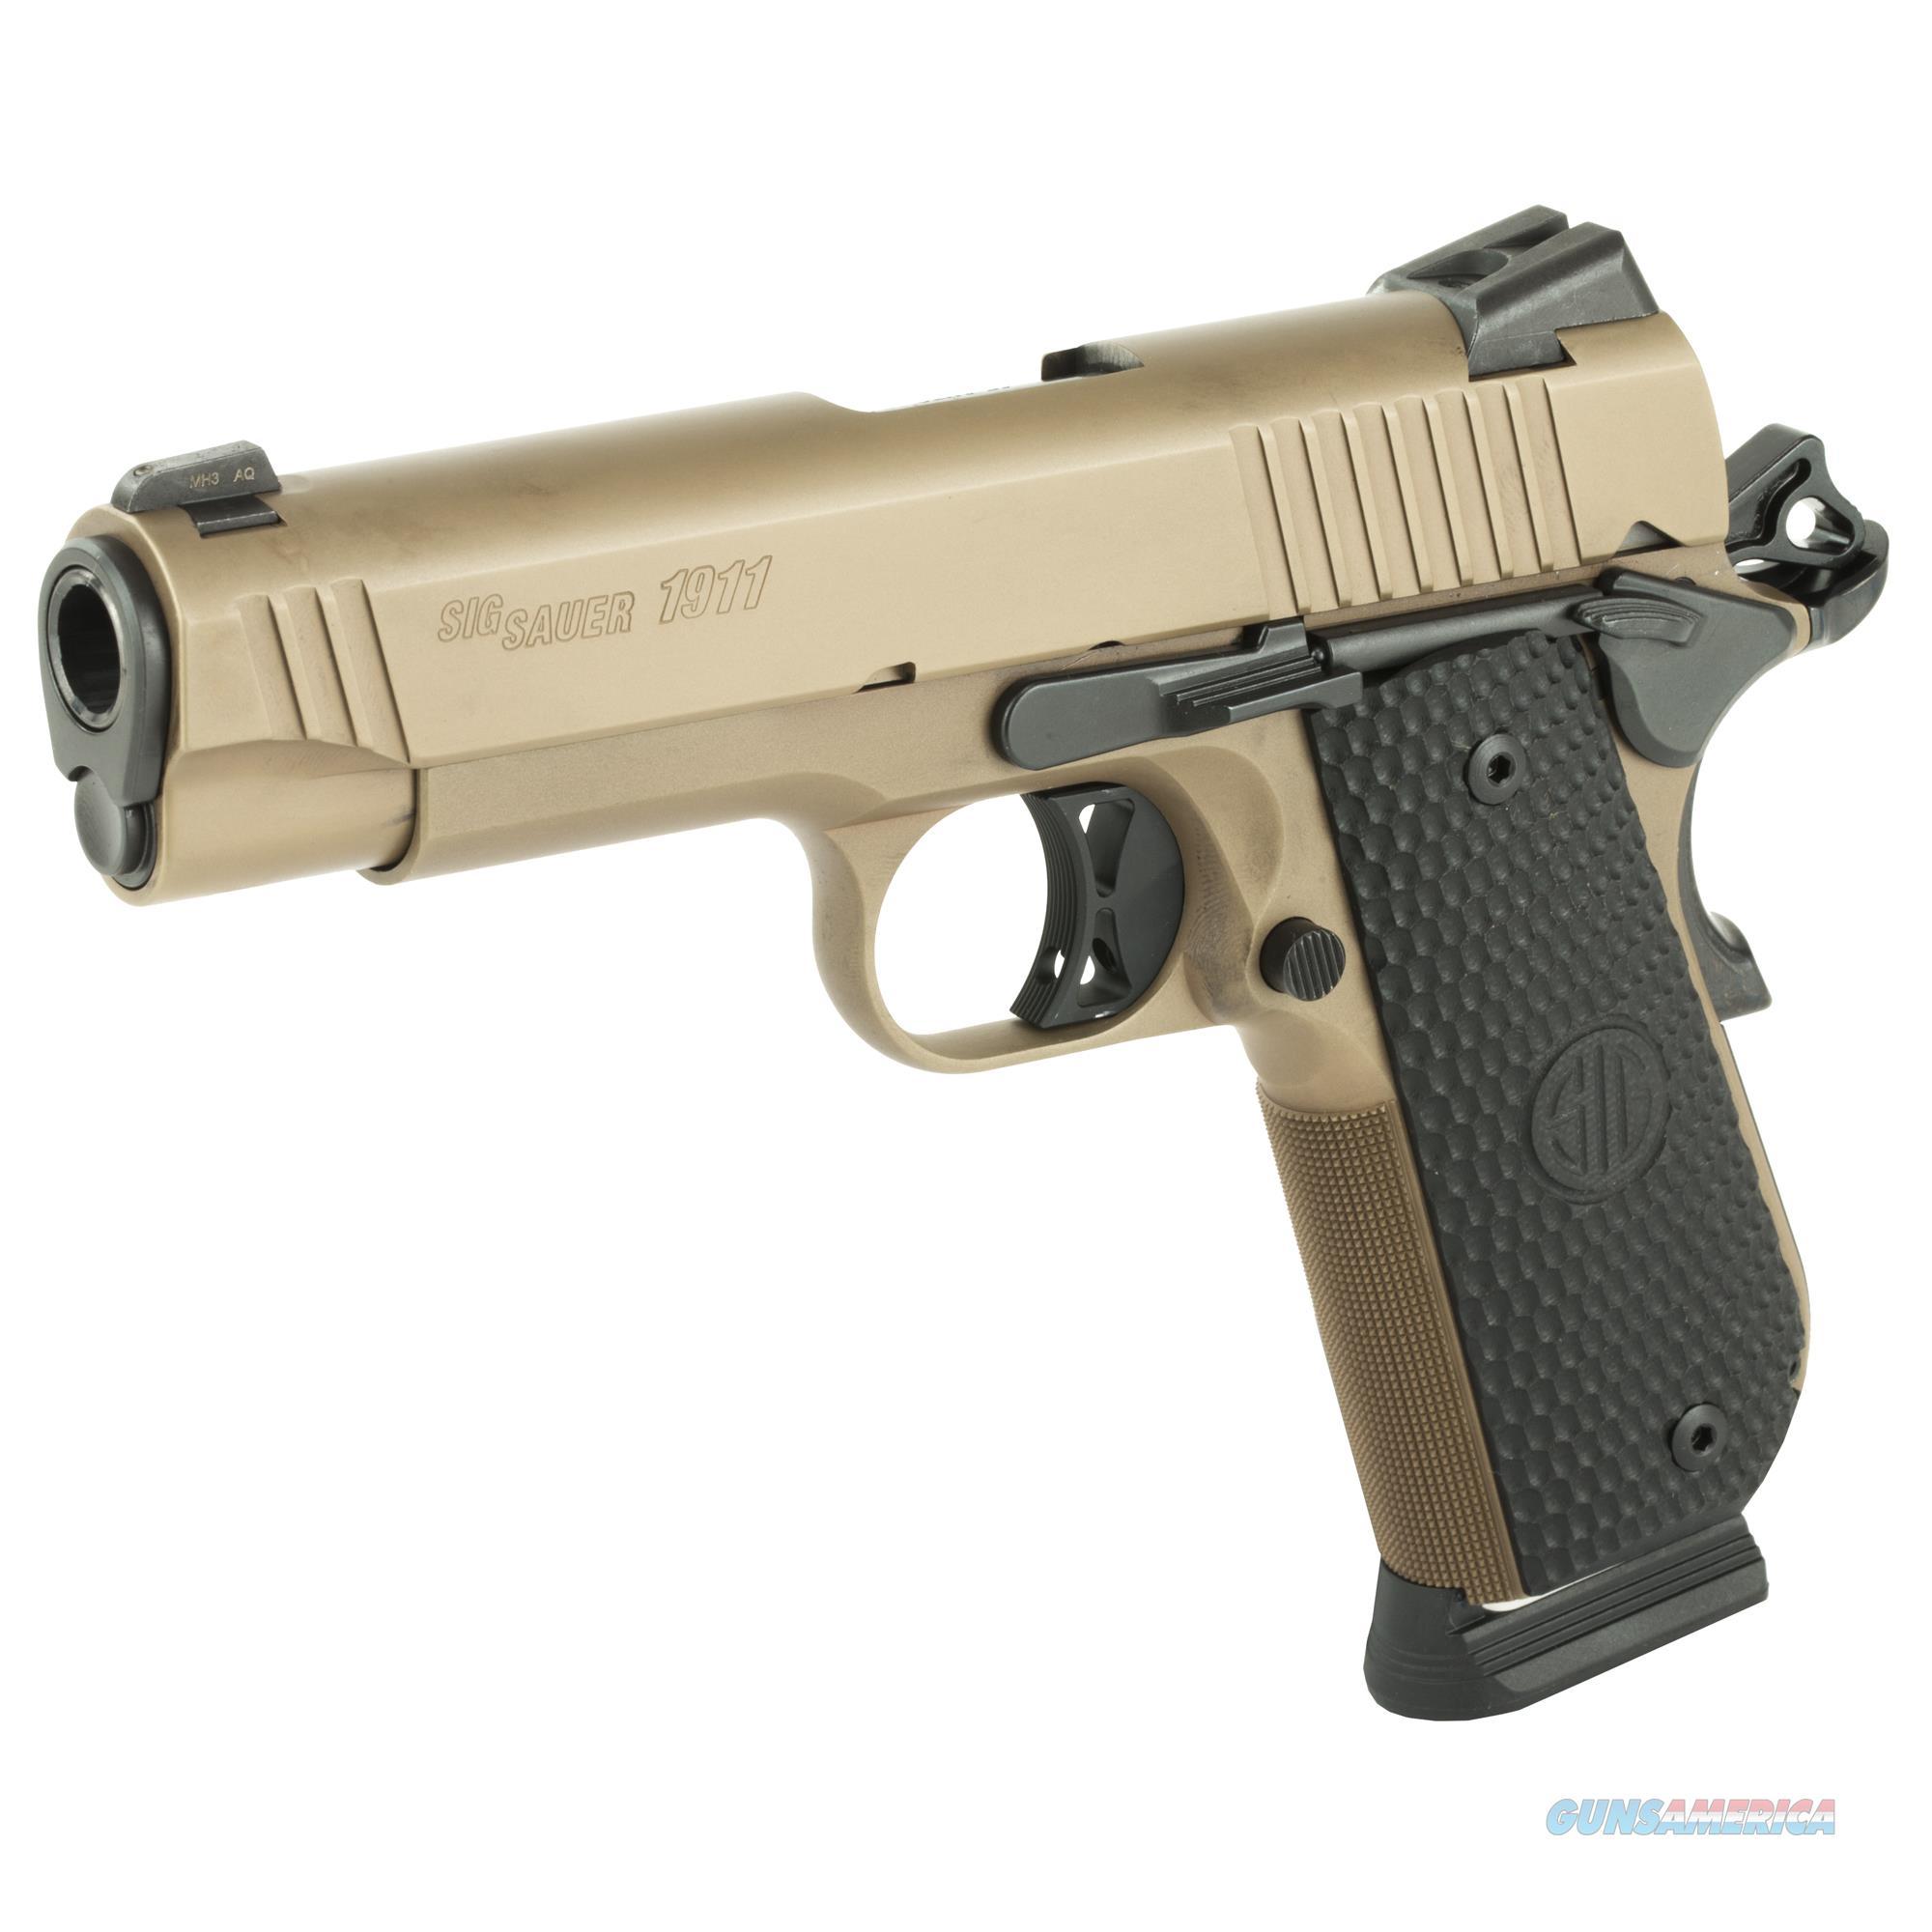 "SIG SAUER 1911TRAD 45ACP 4.2"" FDE SCPN 8RD   Guns > Pistols > Sig - Sauer/Sigarms Pistols > 1911"